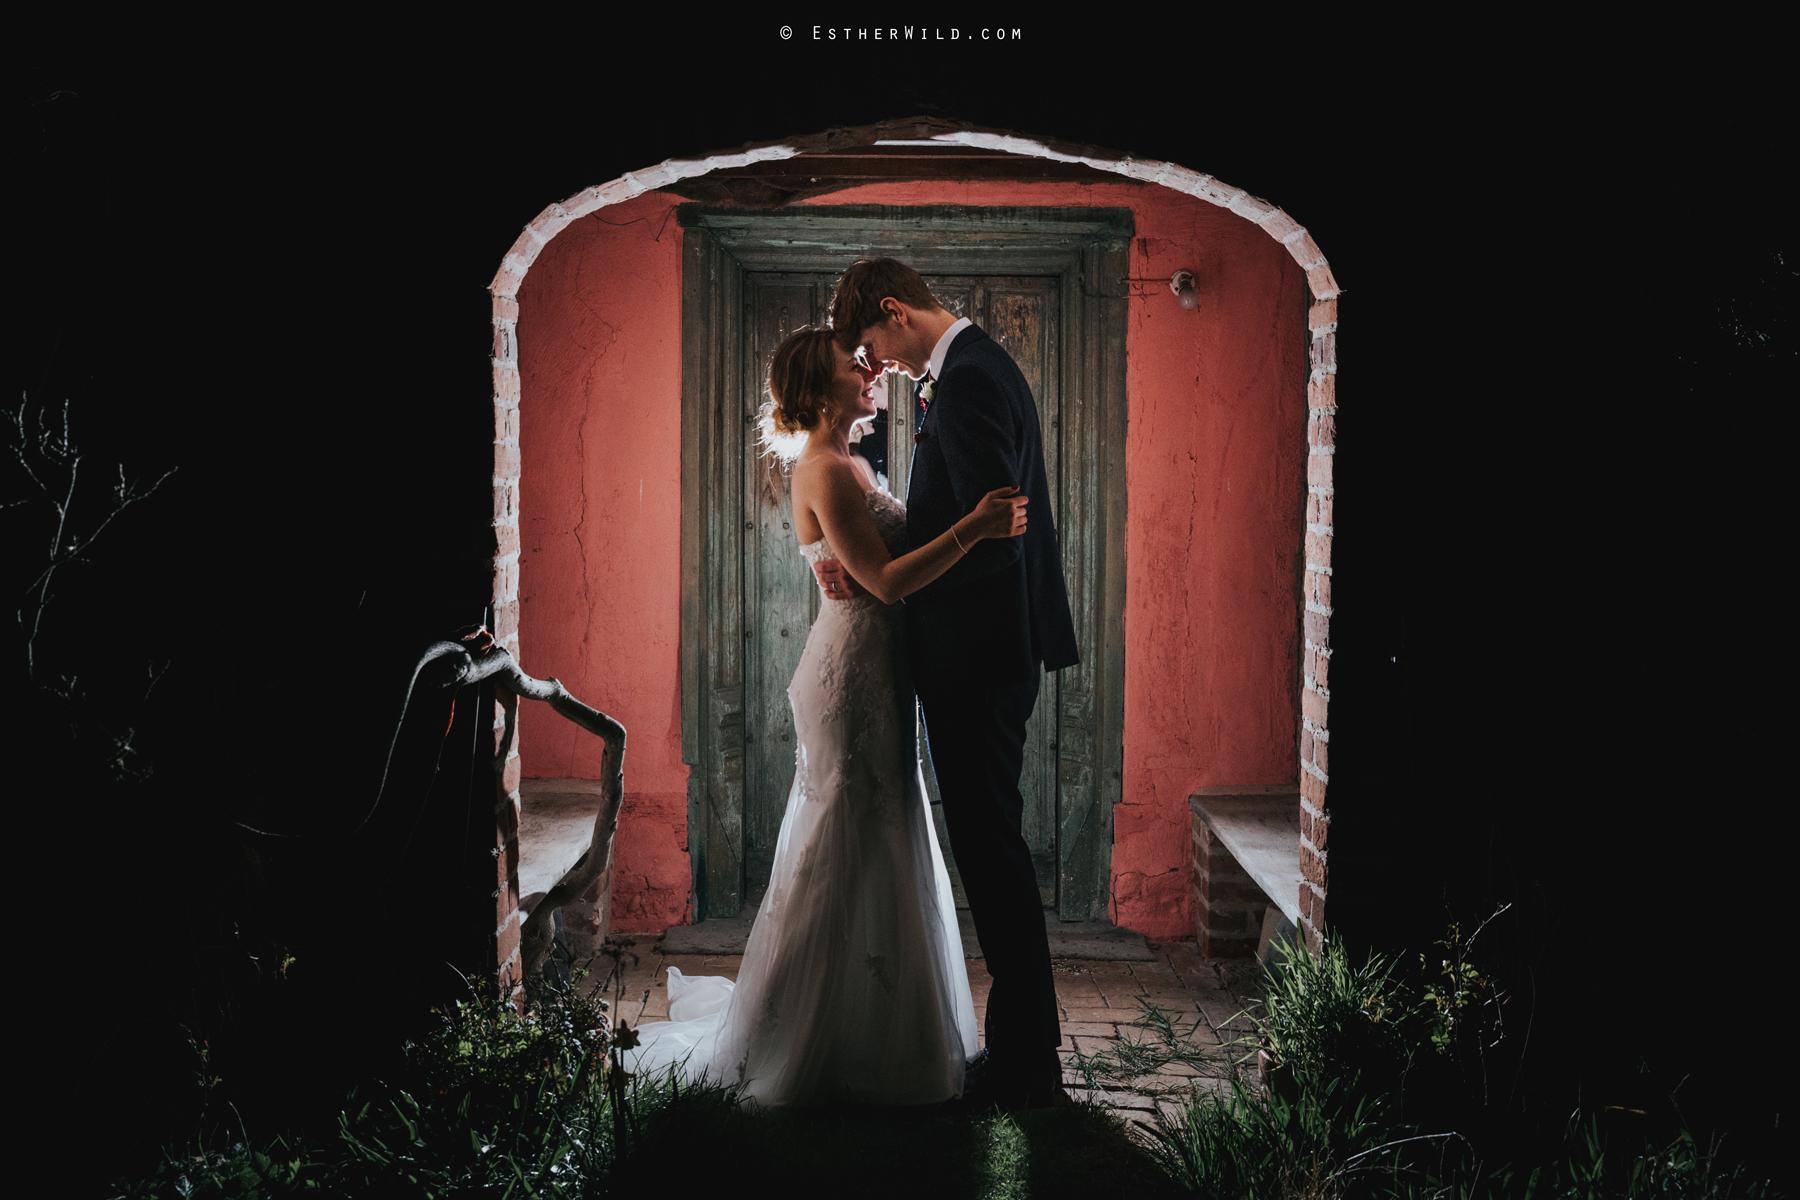 Glebe_Farm_Barn_Rustic_Norfolk_Wedding_Esther_Wild_Photographer_Copyright_IMG_3314.jpg